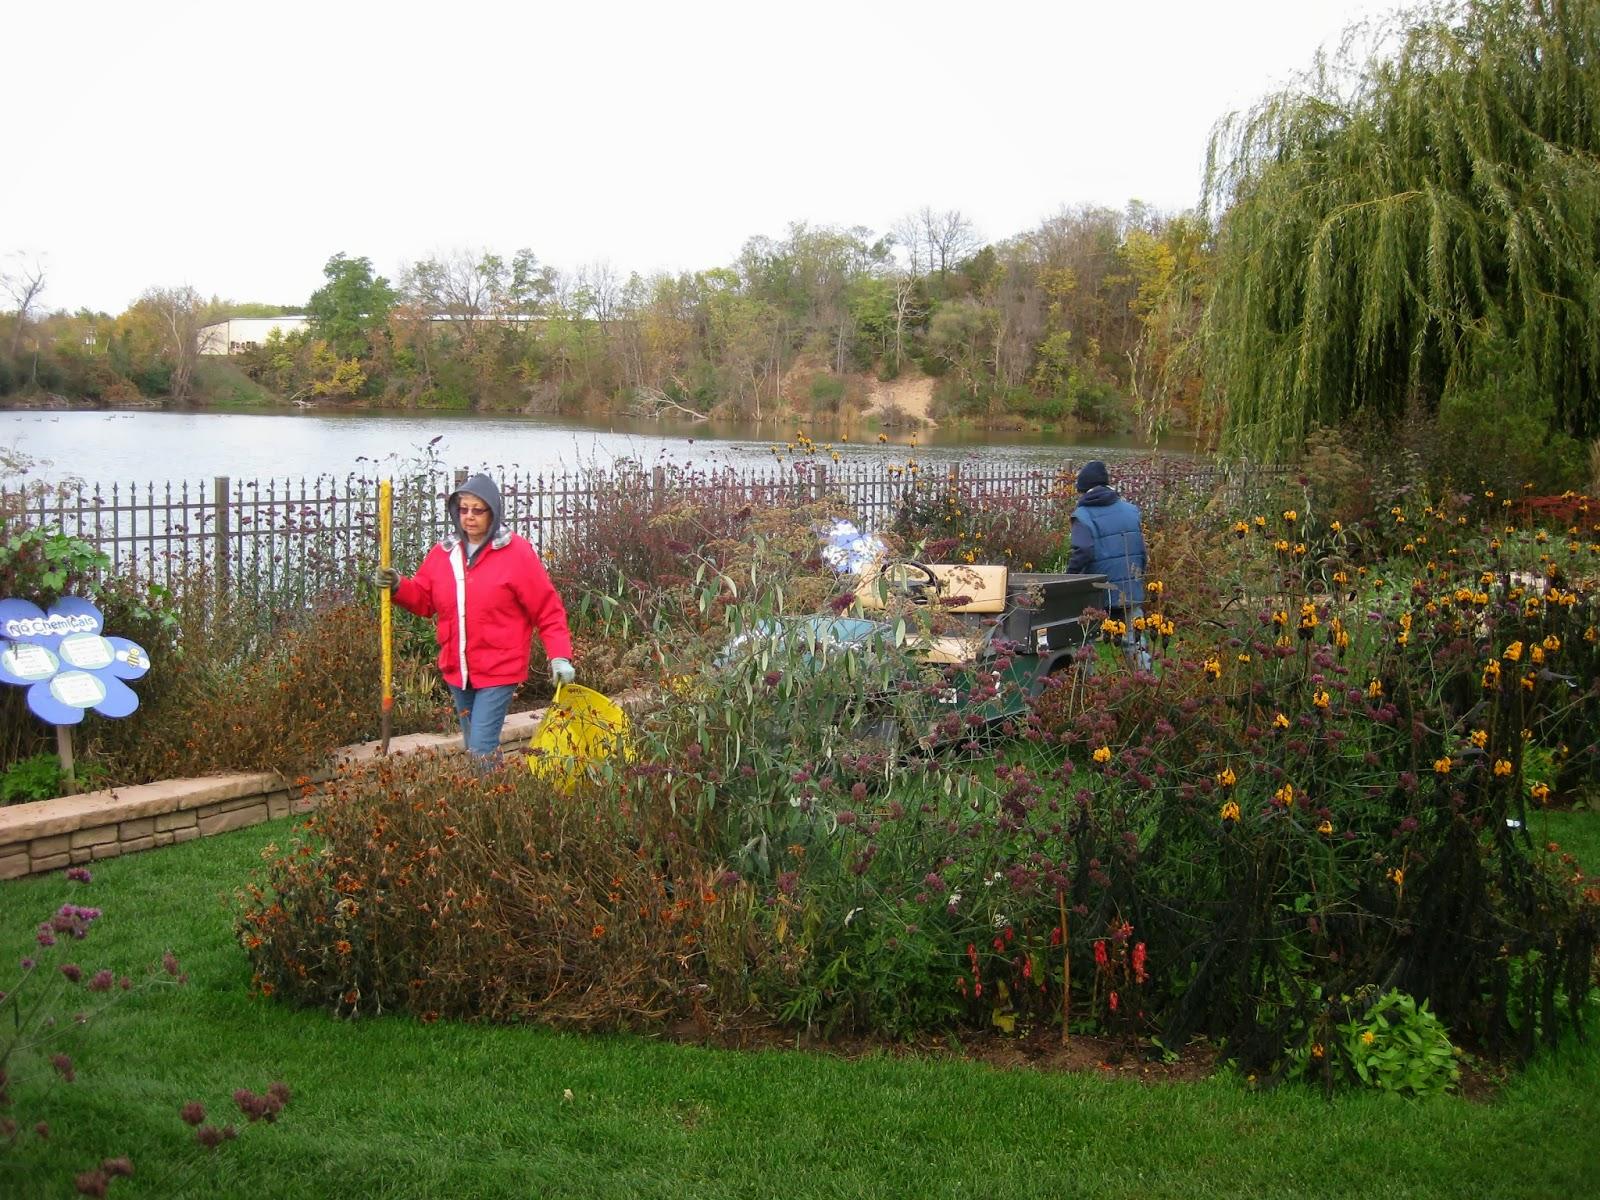 Rotary Botanical Gardens - Hort Blog: The Chain Gang